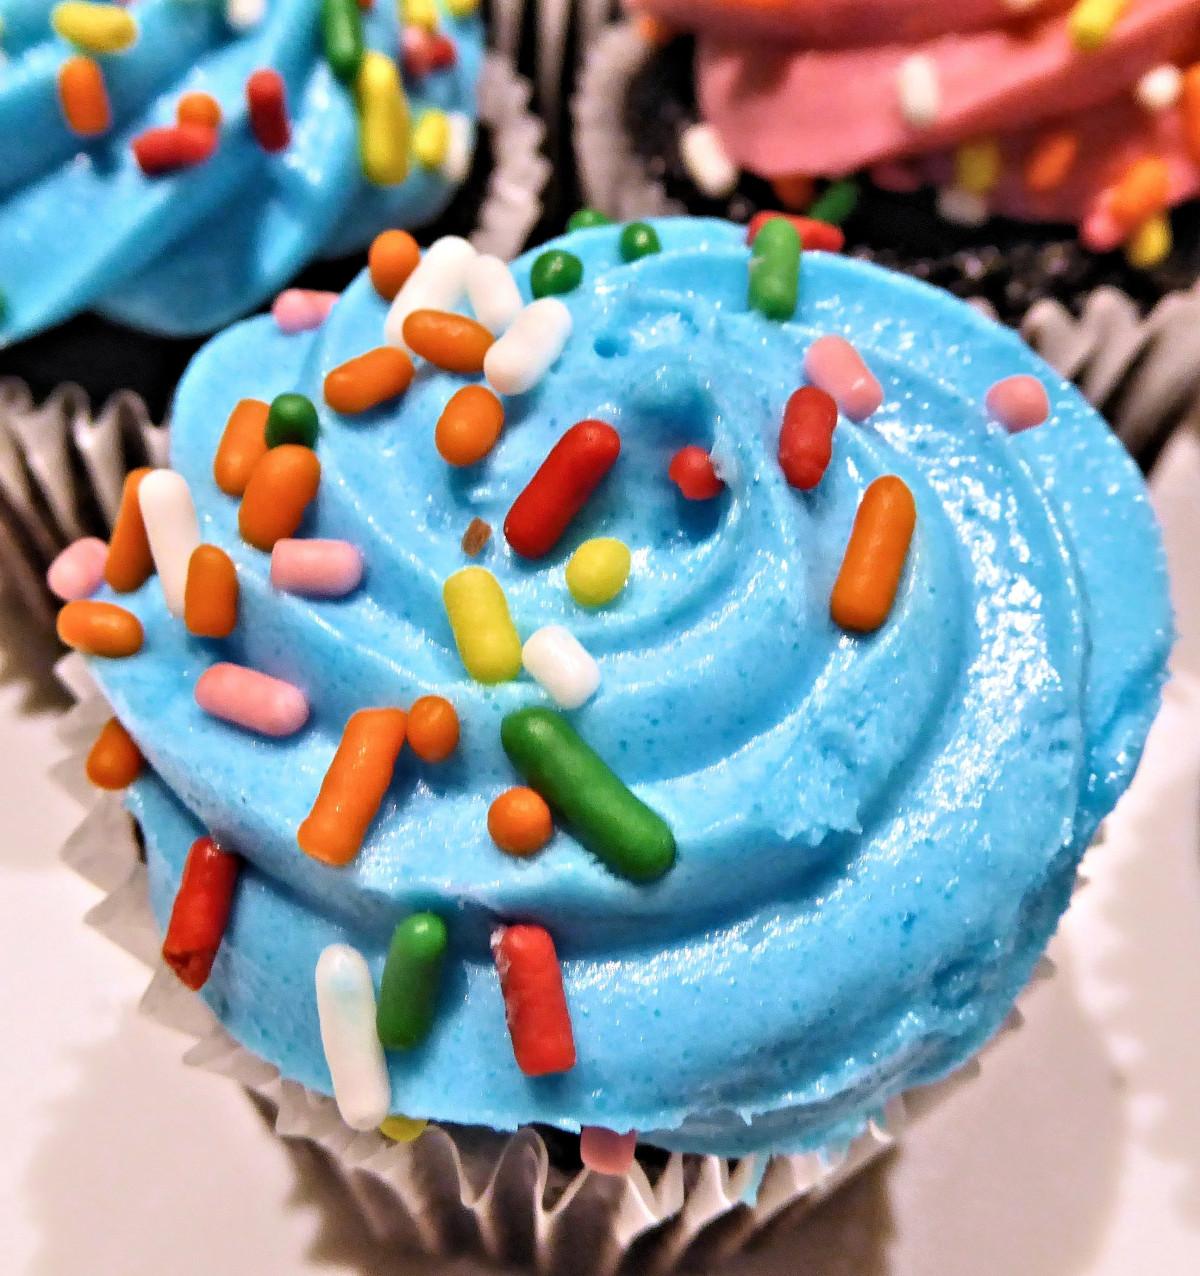 Free Images Sweet Dessert Icing Sprinkles